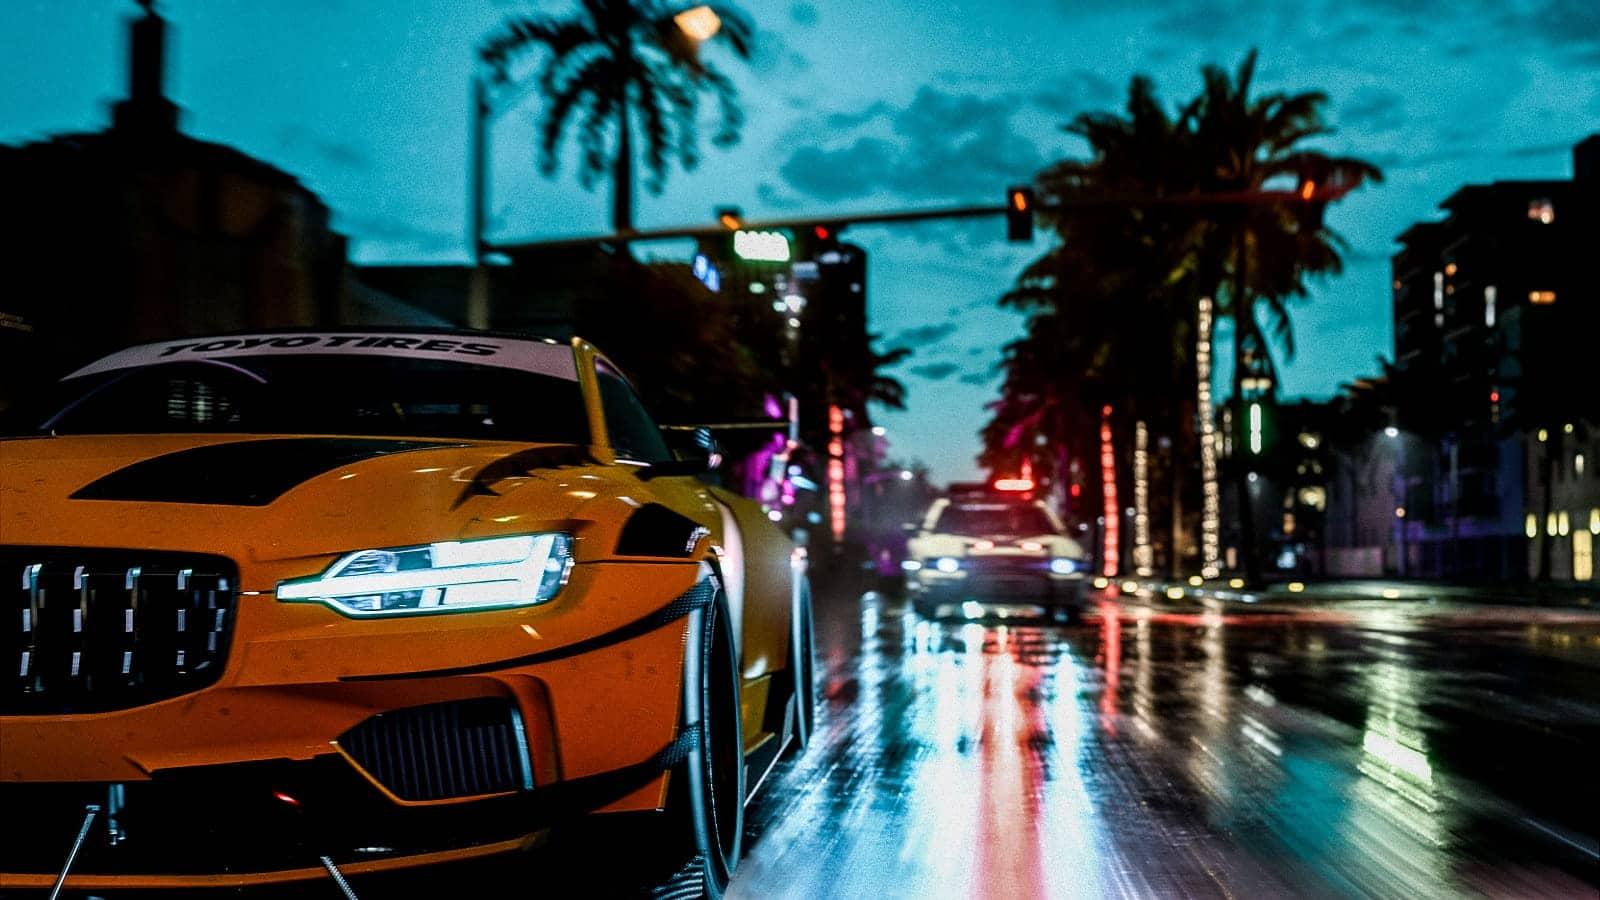 Car Games - Drive the best cars online | PacoGames.com